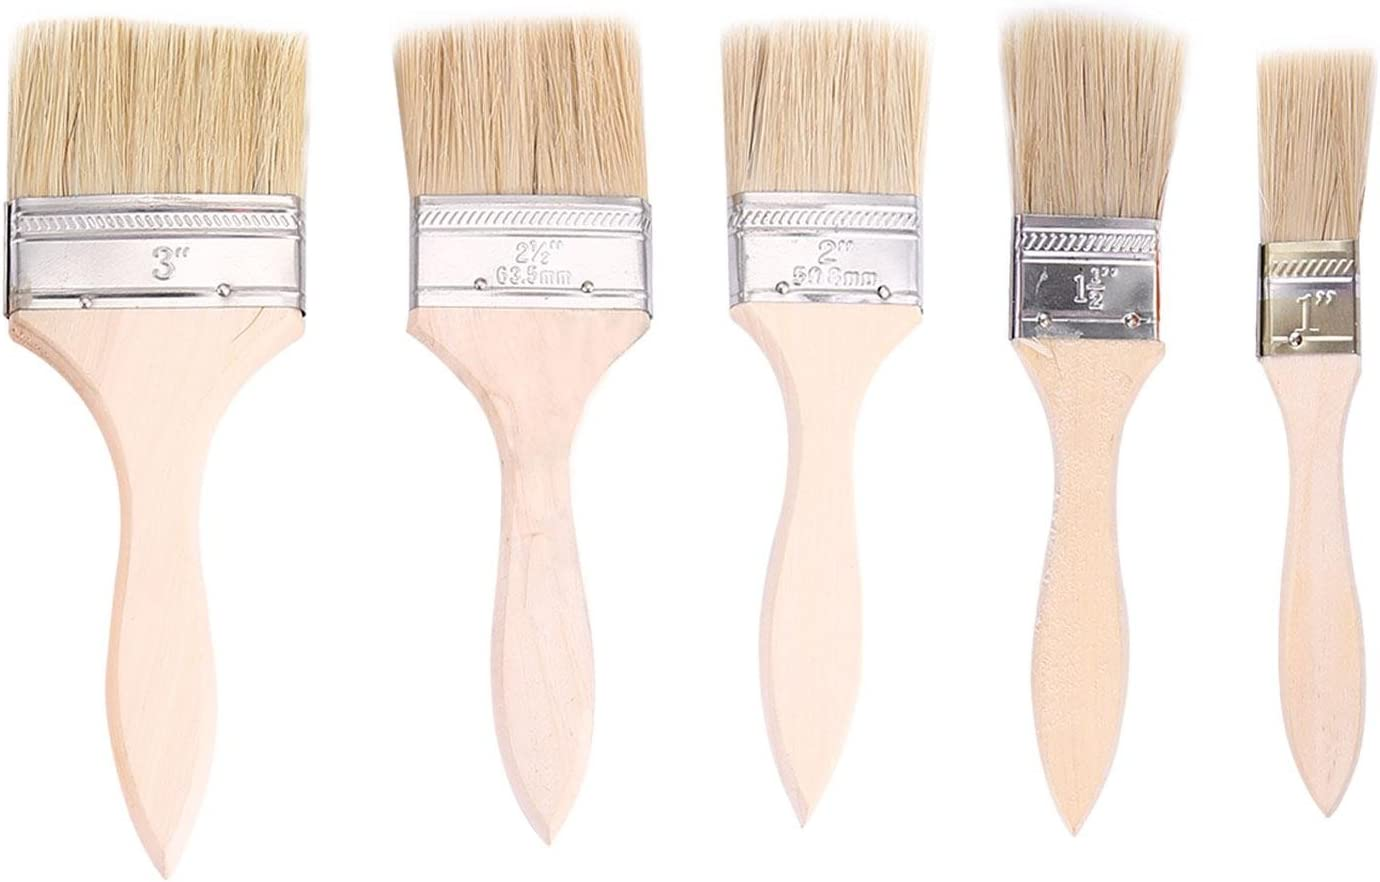 2,54 cm KOBWA Kit de brochas de Pintura Premium para Rodillo DE 8,7 Pulgadas 6,35 cm 2,54 cm 5,7 cm Mango de Madera Ligero 3,81 cm Pinceles de Pintura de 7,62 cm